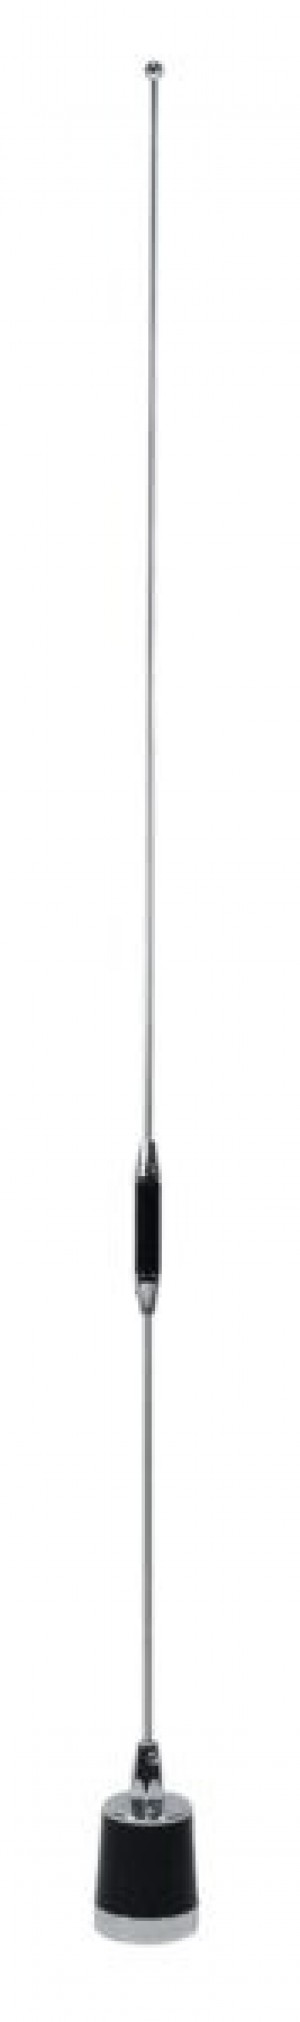 Midland MicroMobile MXTA11 6db Gain Antenna